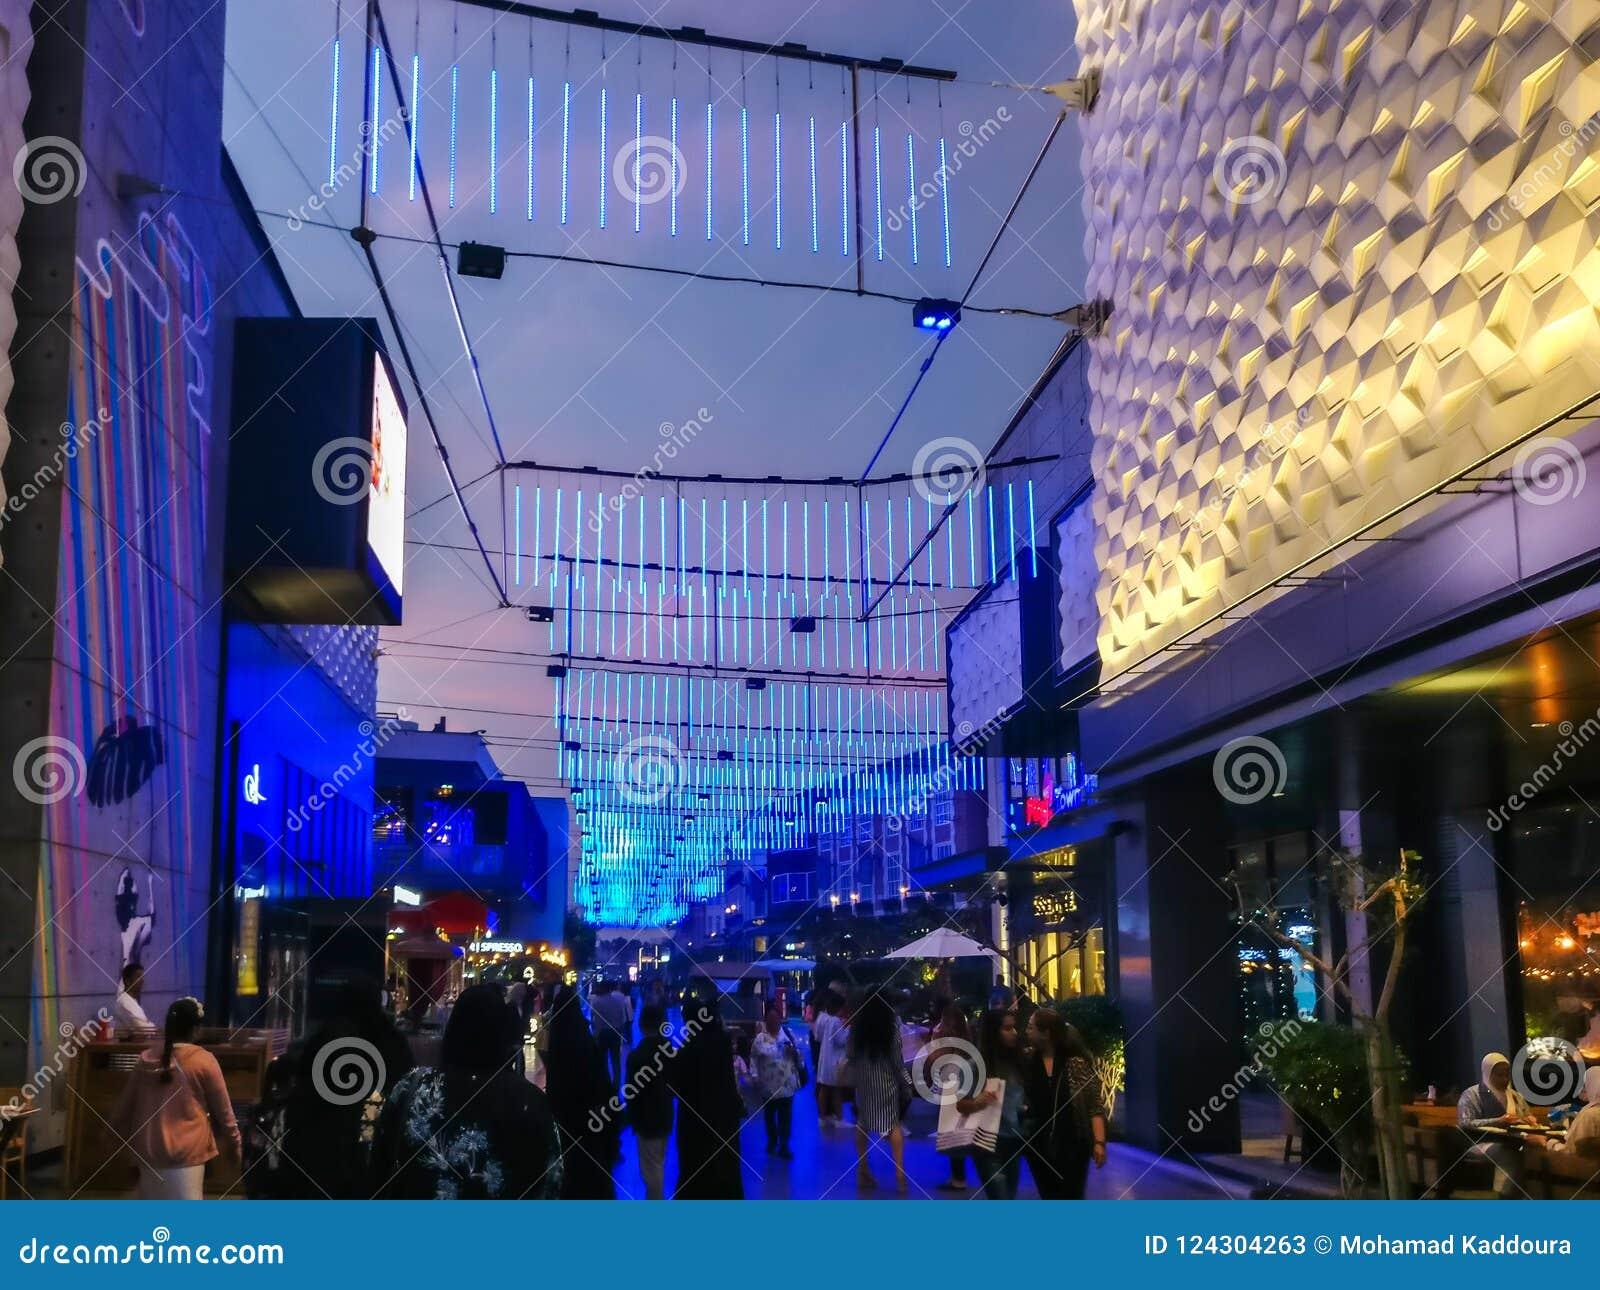 Dubai epic neon light interior design of the dubai city walk at night